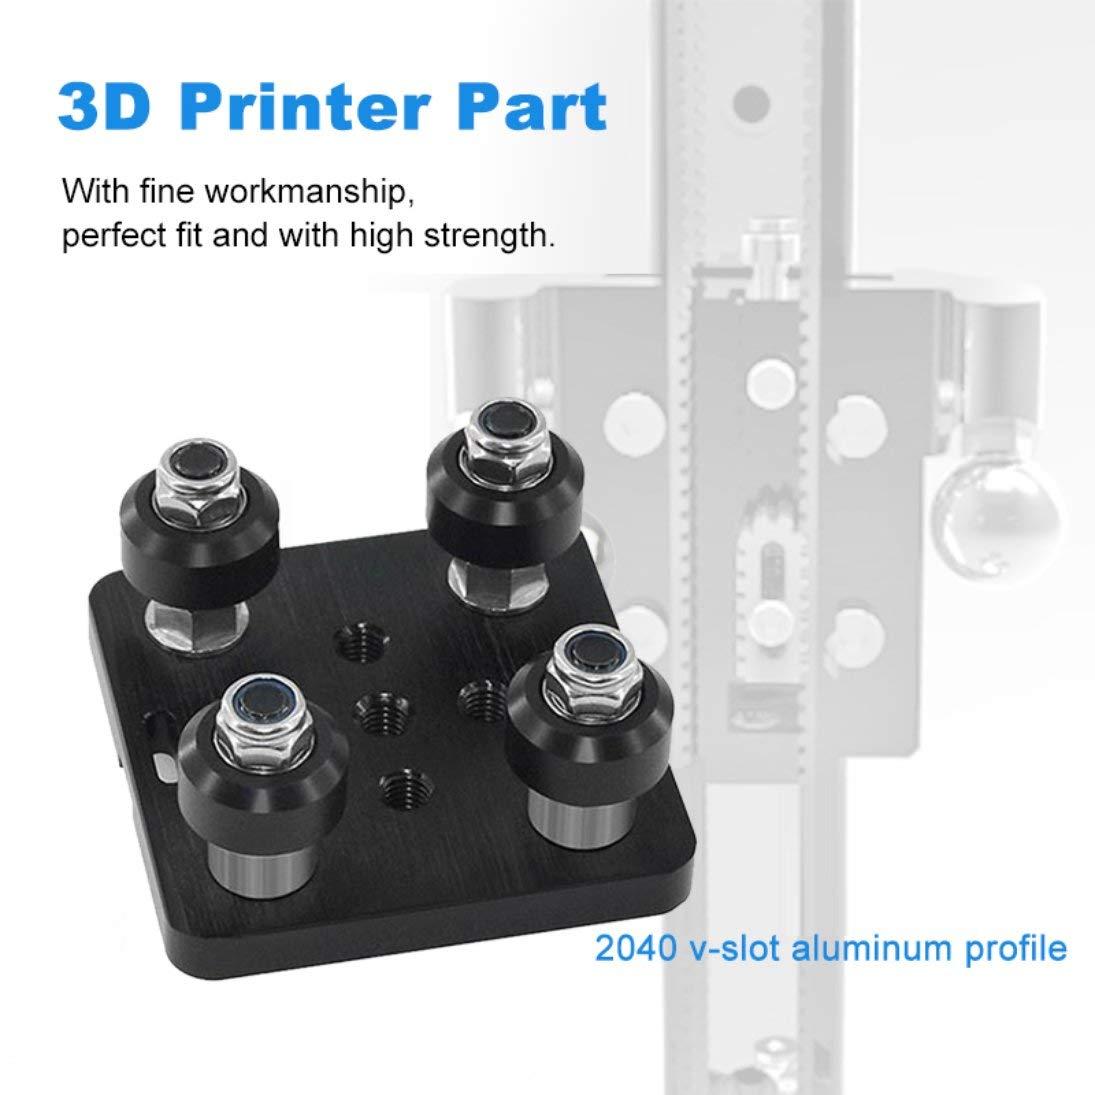 WEIHAN Openbuilds V Gantry Plat Set 3D Printer Part V Linear Actuator System Slide Plate For 2040 V-slot Aluminum Profile Black